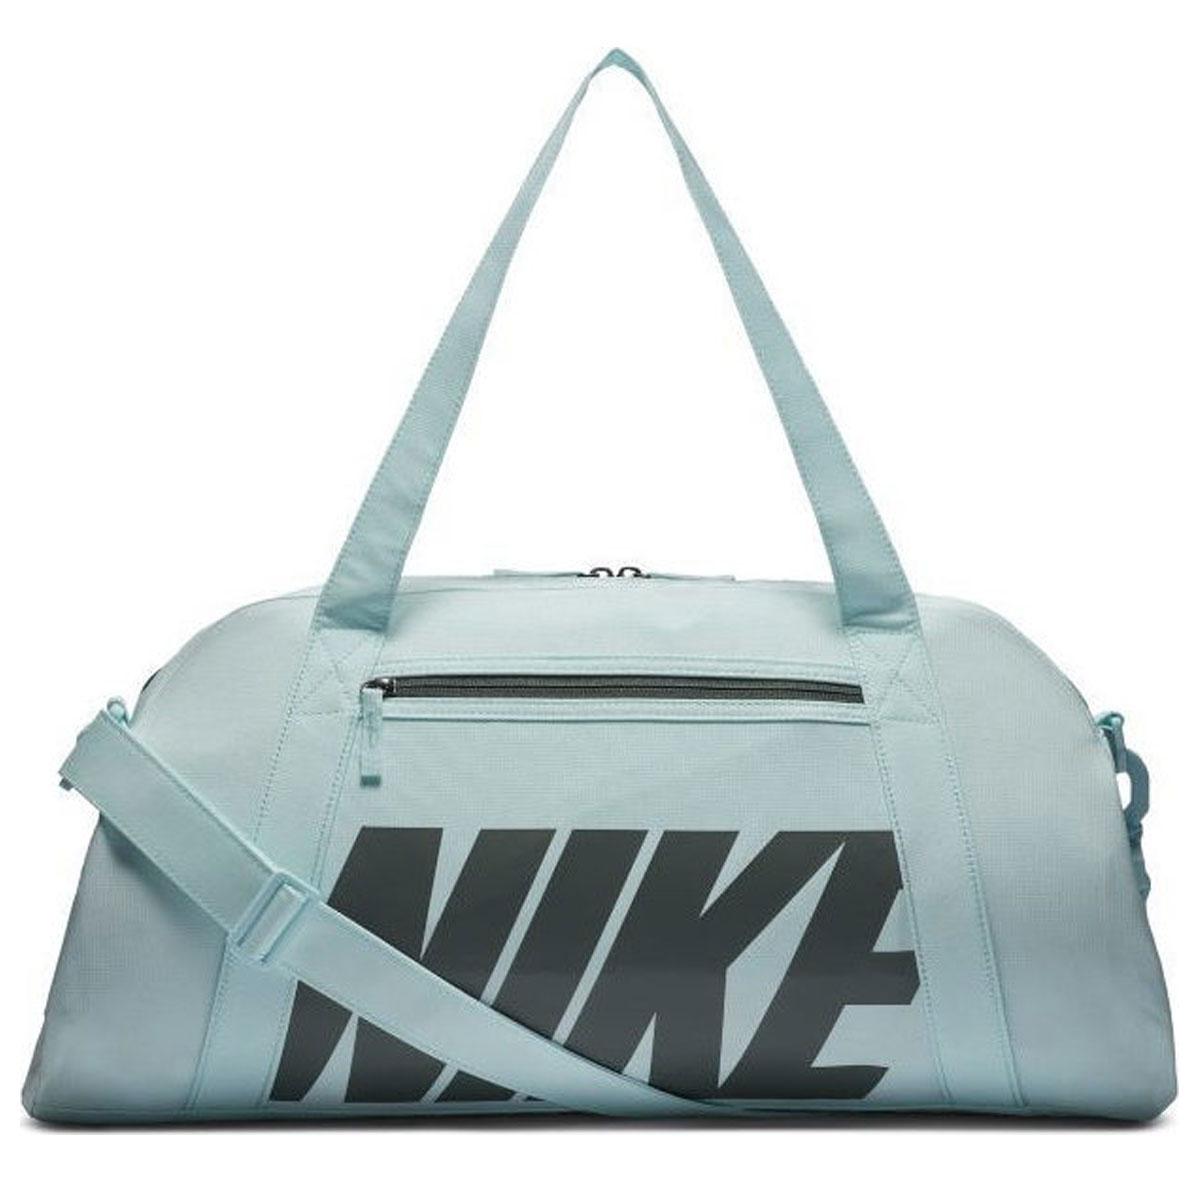 1dc84675179 Nike Gym Club Sporttas GROEN online kopen bij Sportpaleis.